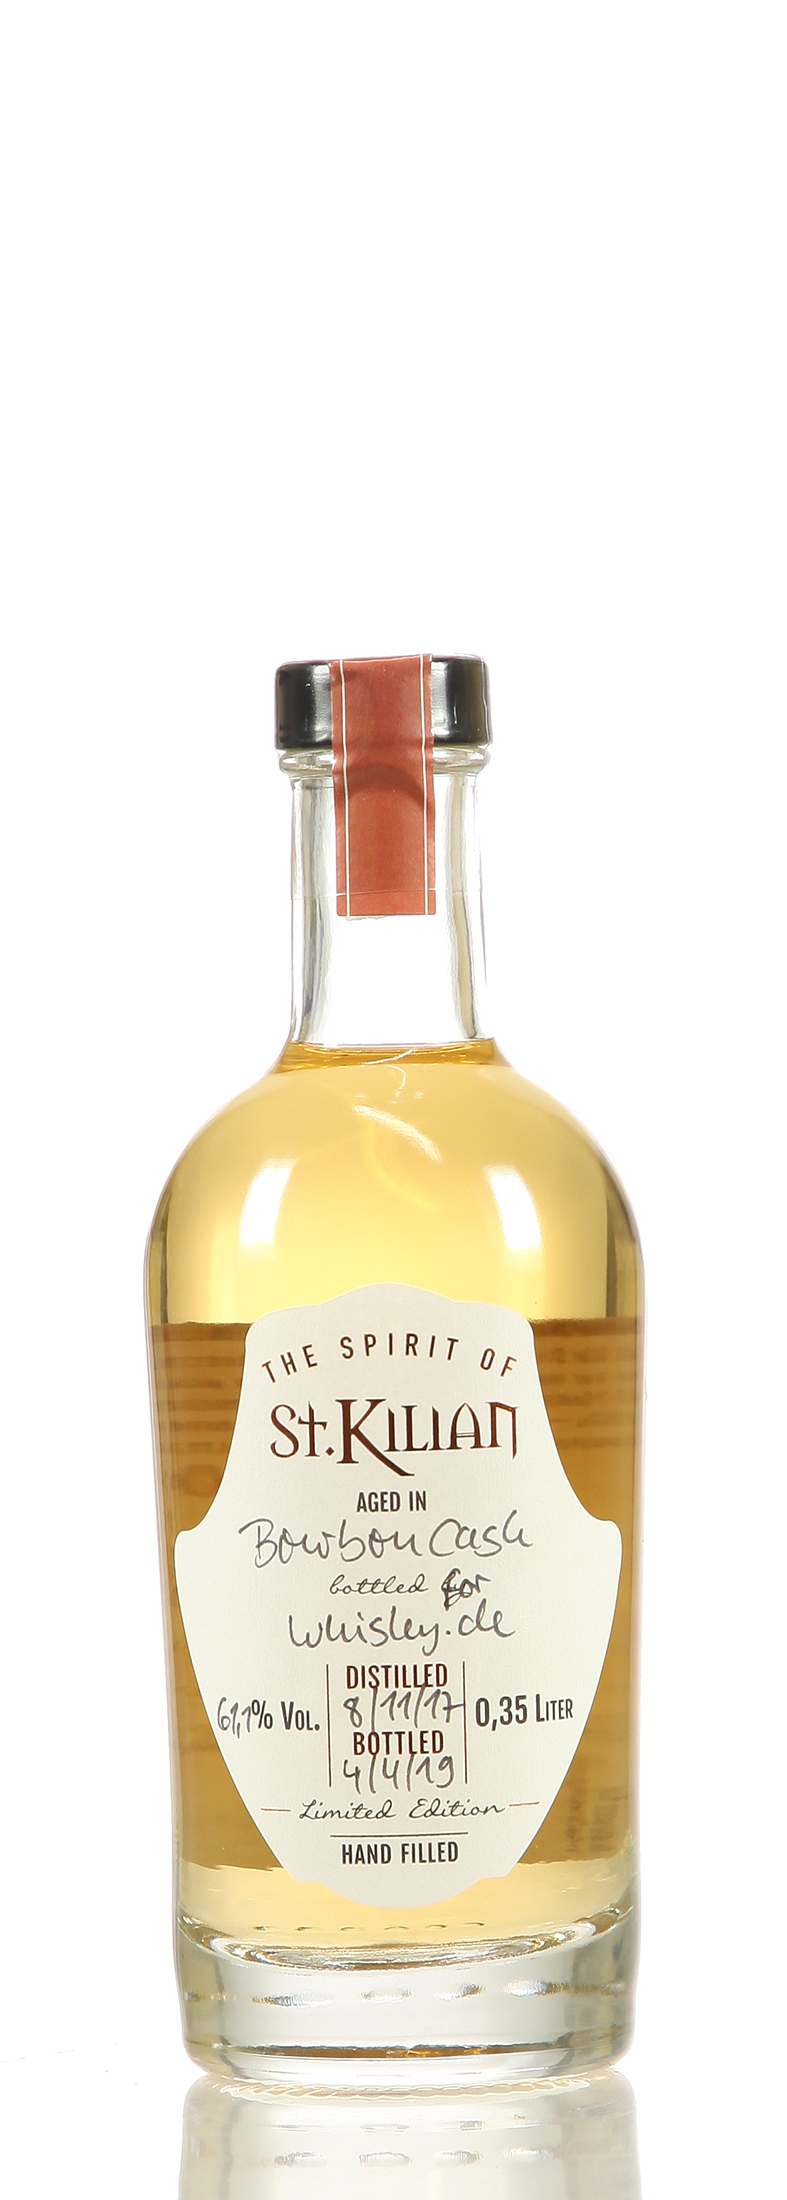 St. Kilian The Spirit of St. Kilian